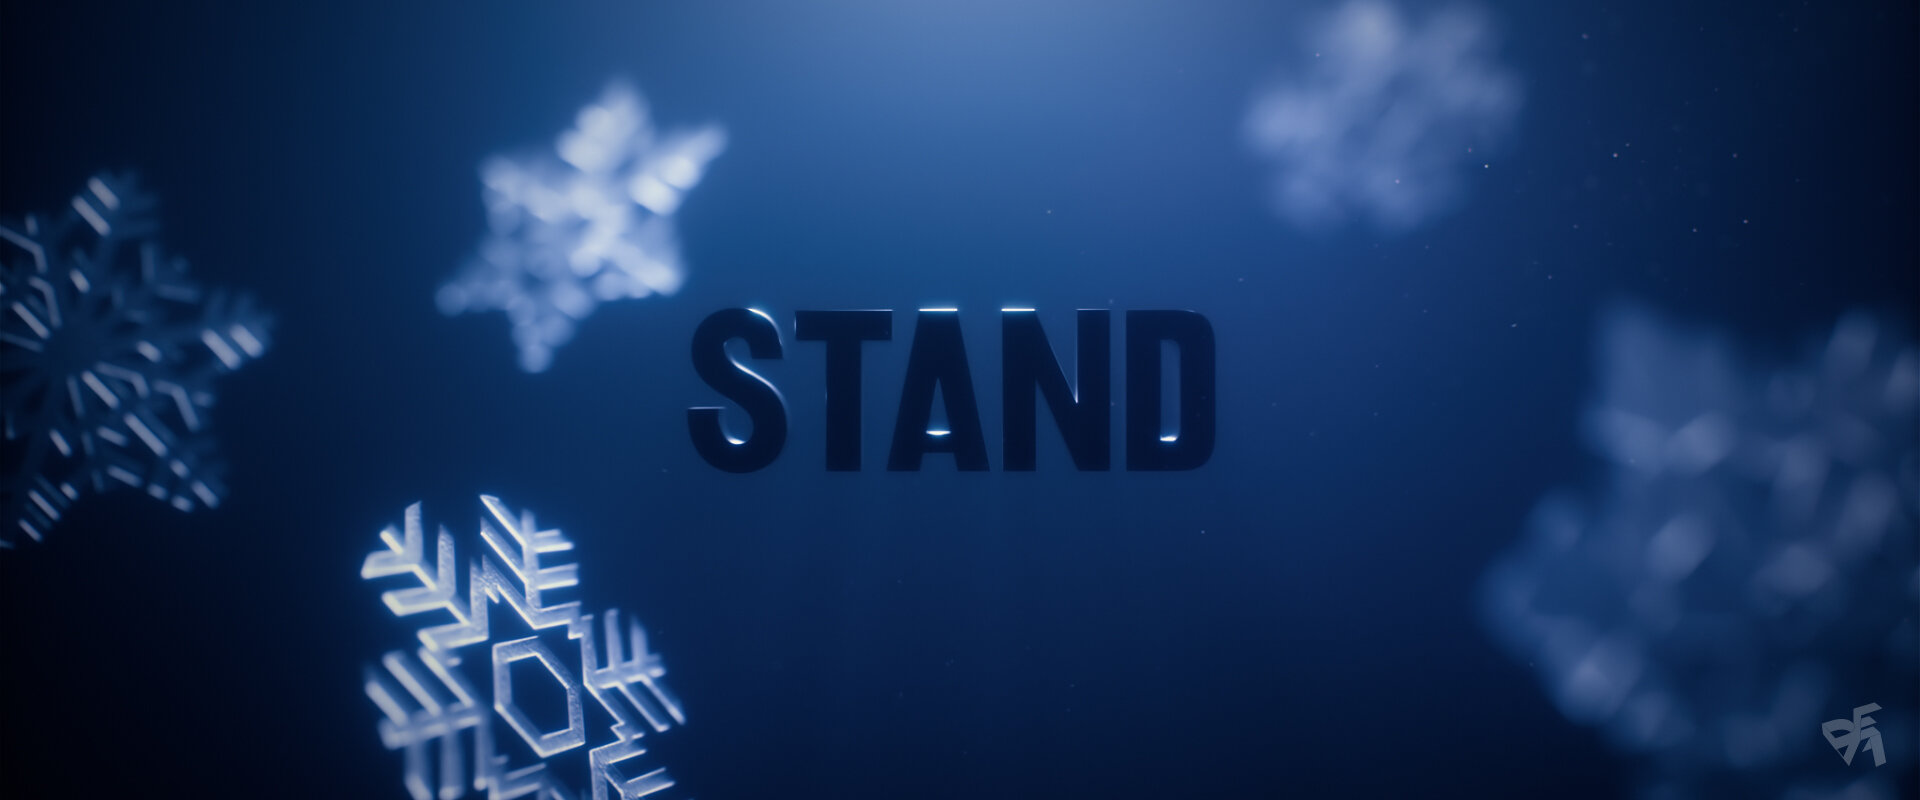 CARD_06_Stand.jpg